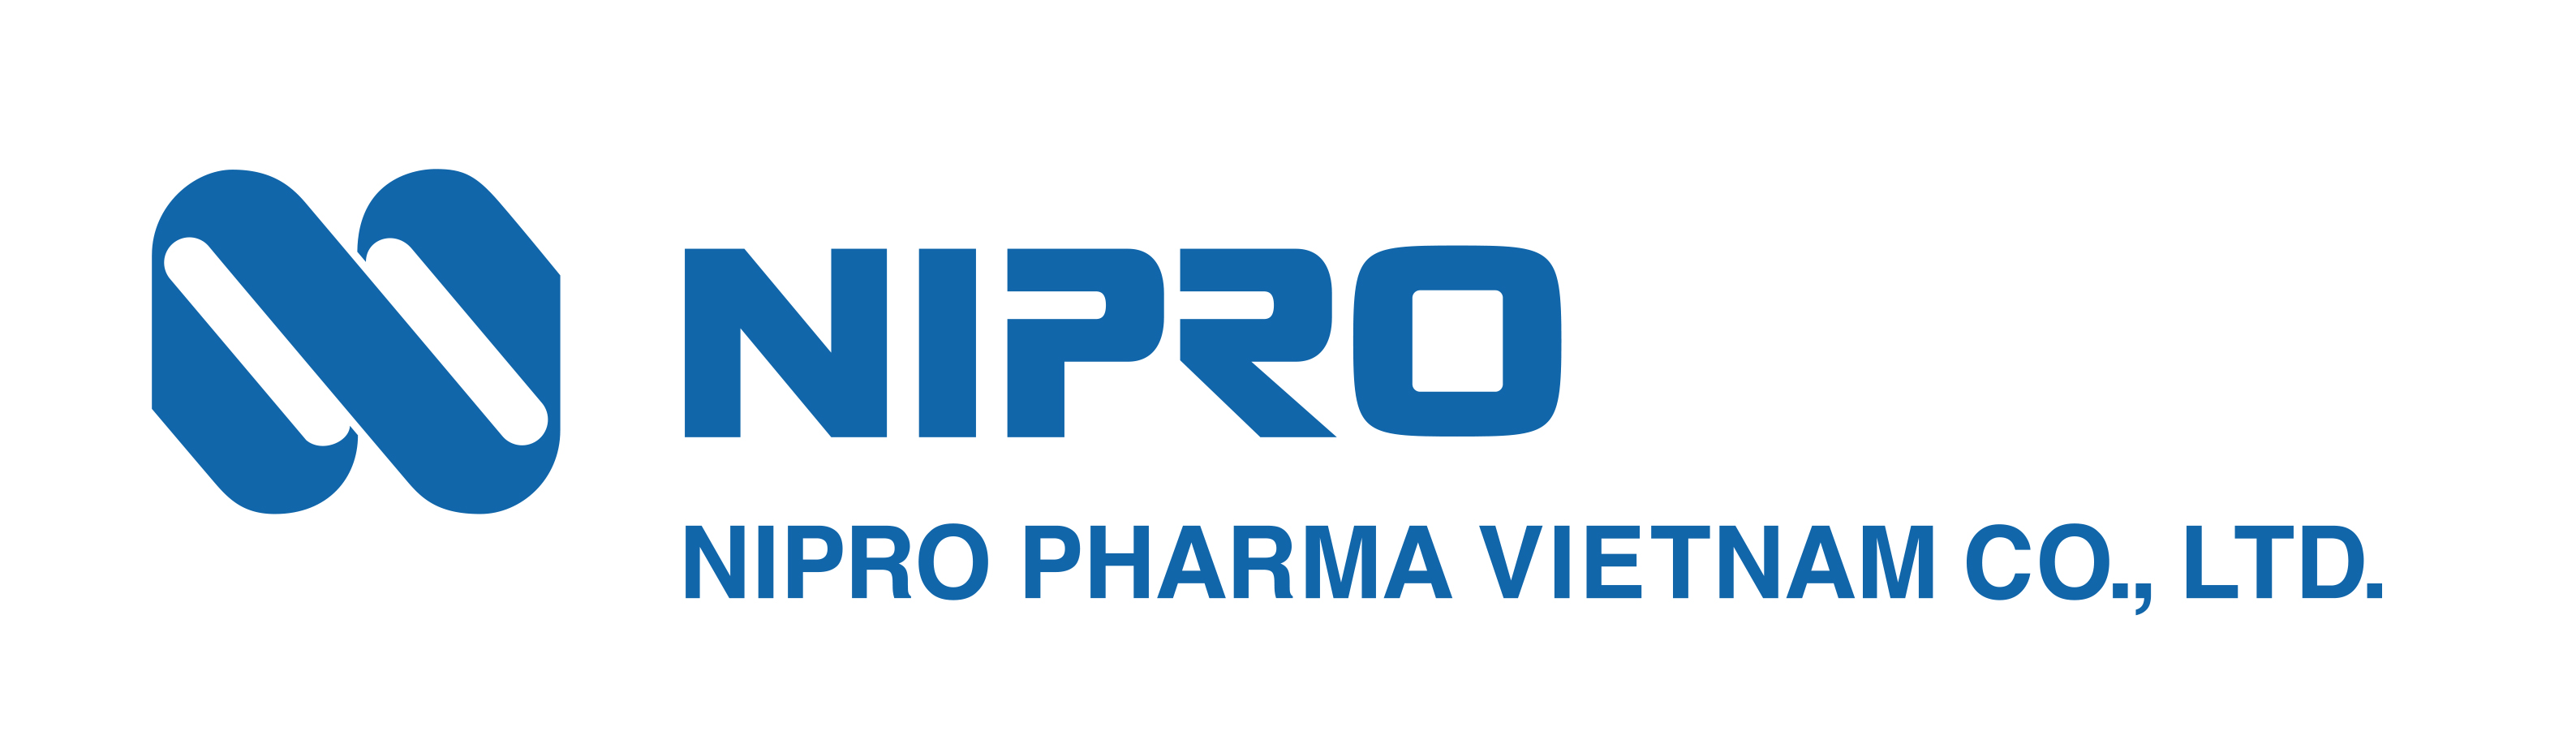 Nipro Pharma Vietnam Co.,Ltd.ロゴ